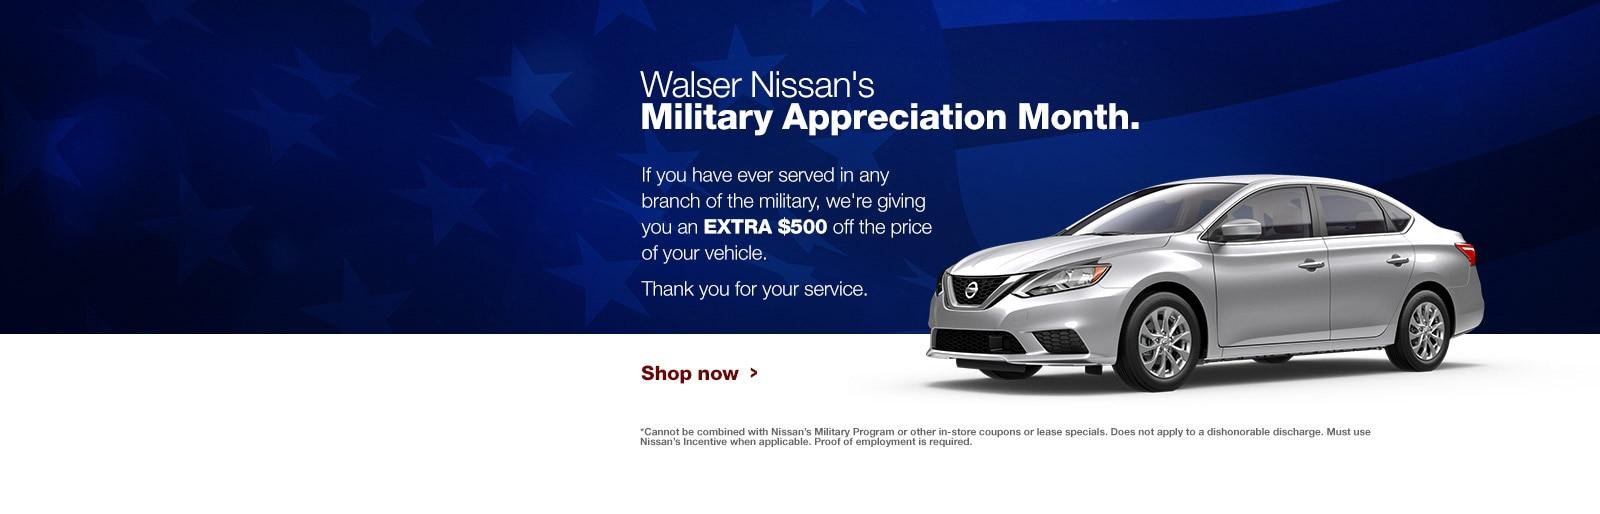 Welcome to Walser Nissan Burnsville | Dealer in Burnsville, MN